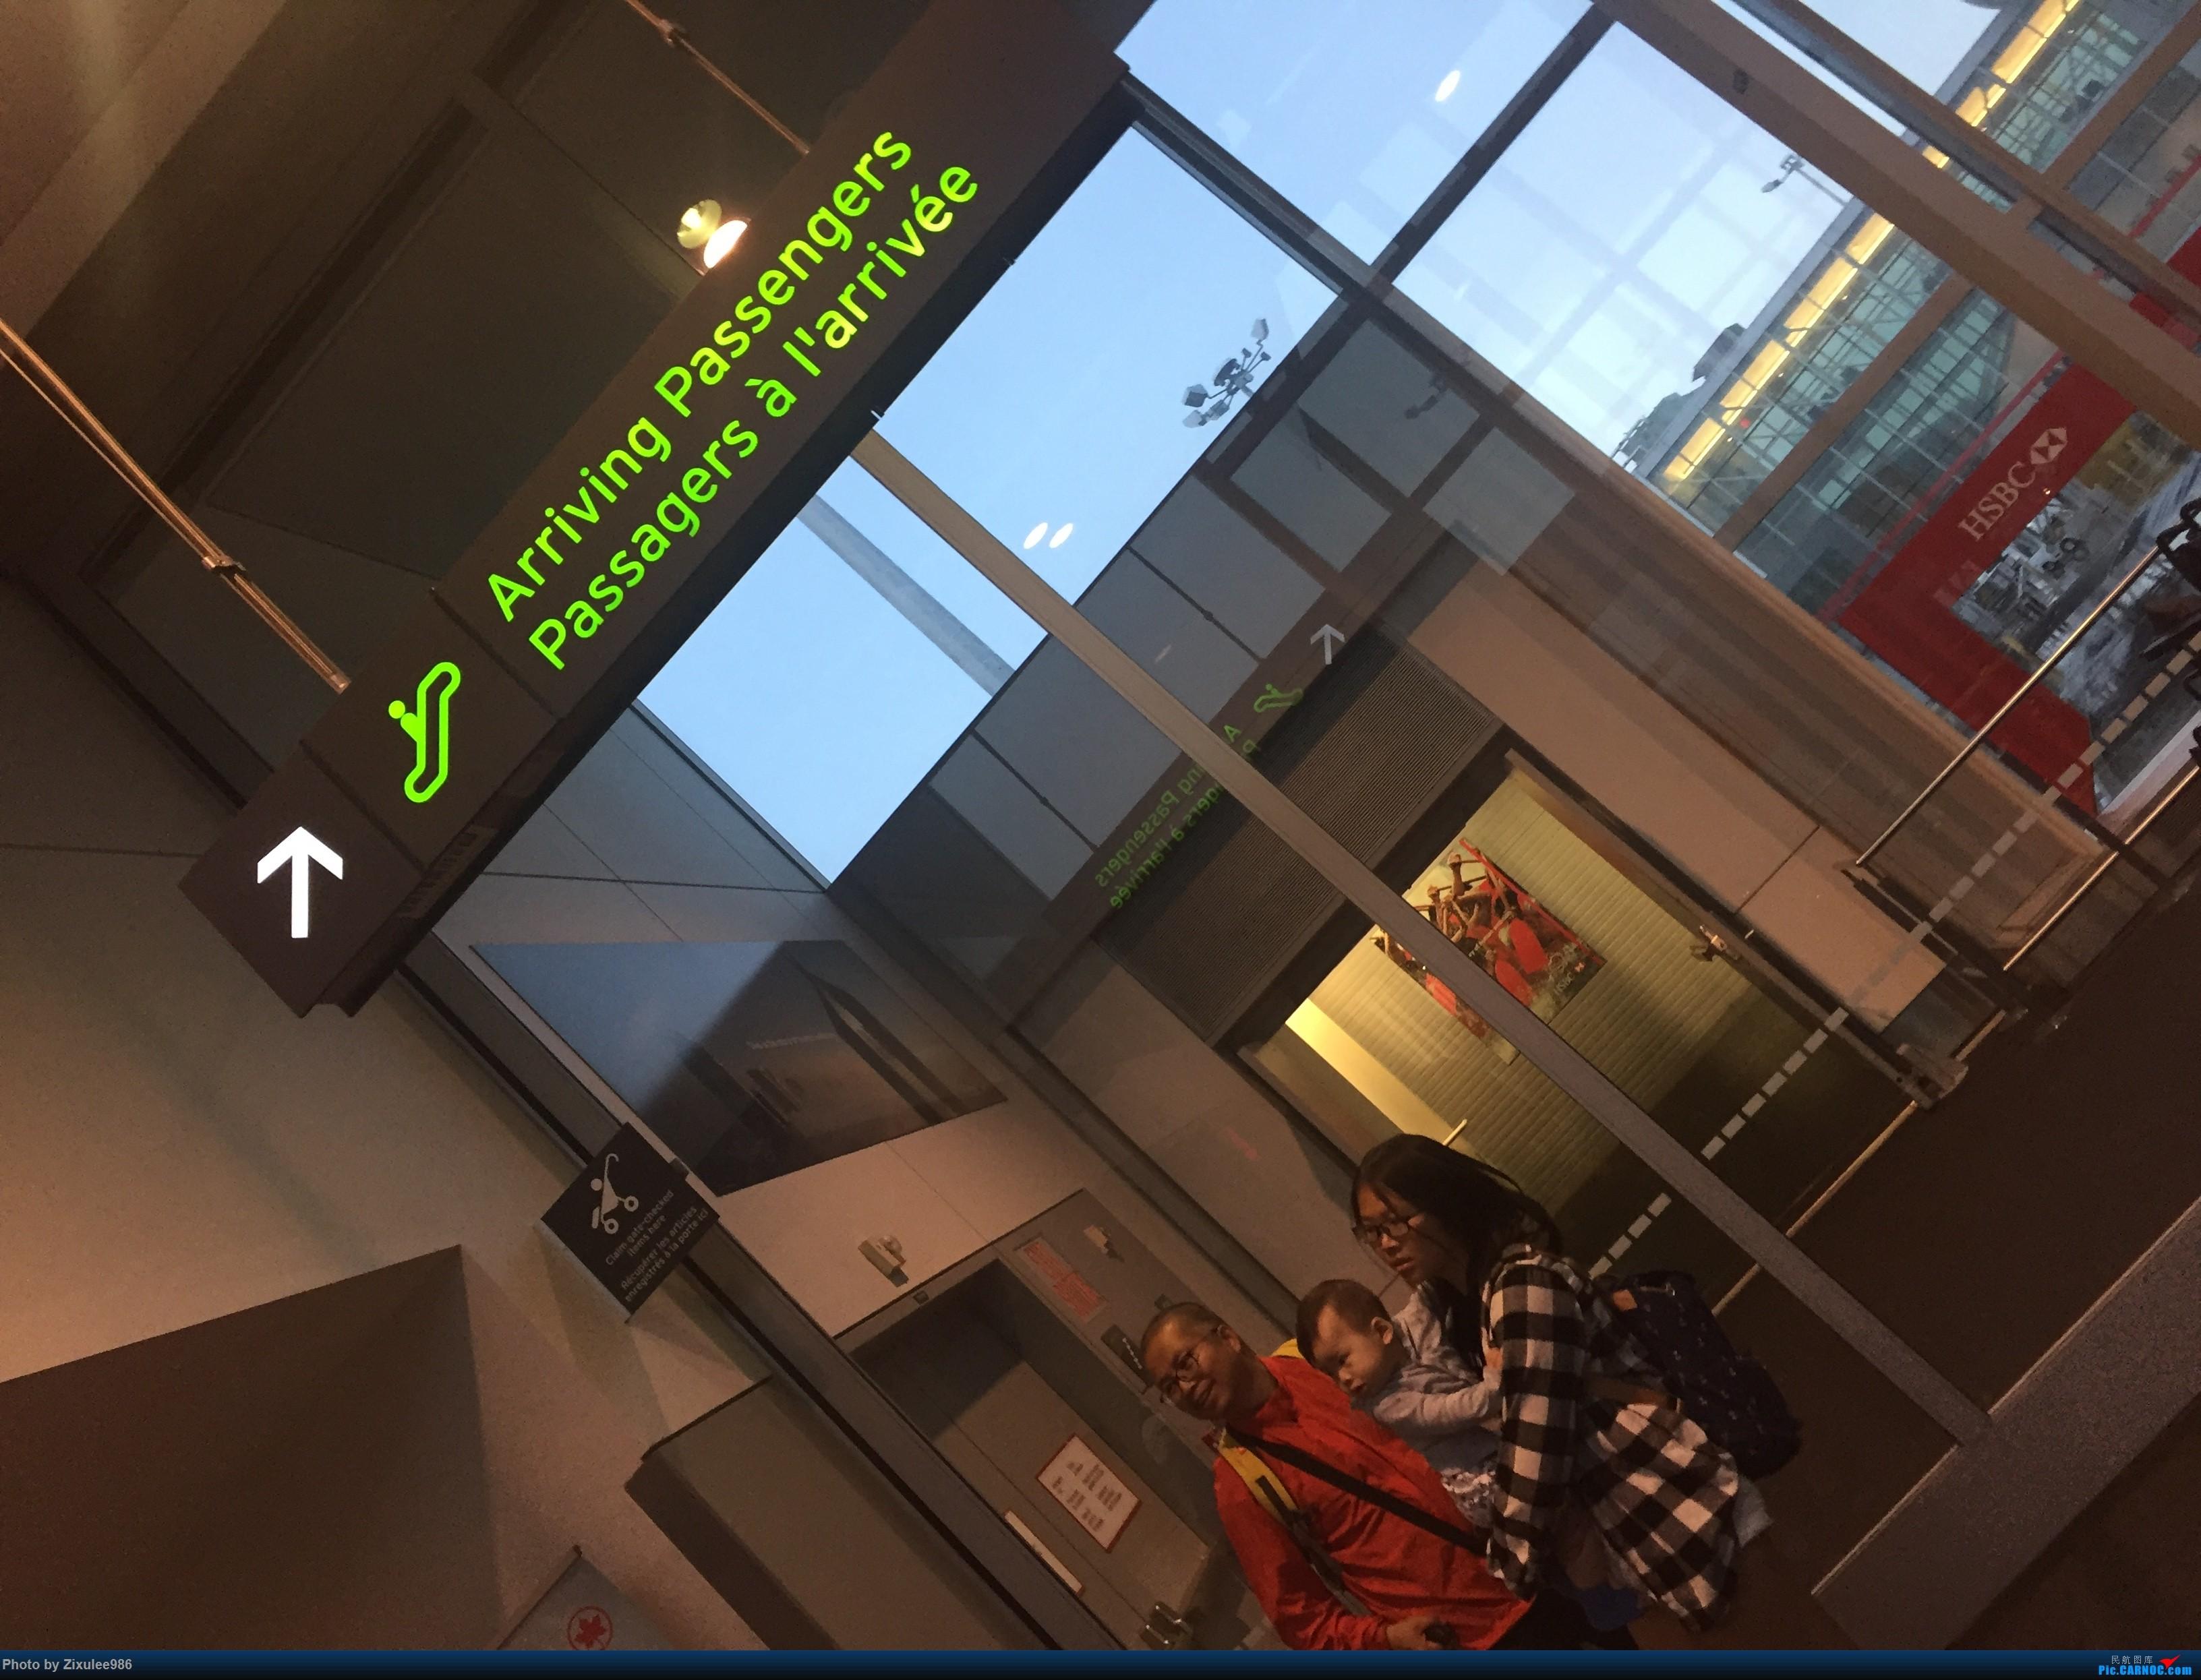 Re:[原创]加拿大21日游学之旅 (二)~加航AC28..PVG-YYZ到达多村后的雨天~多图缓更(将会附上上一集忘发的flightlog)请各位大侠谅解~ BOEING 777-333 (ER) C-FITL 加拿大多伦多皮尔逊机场 加拿大多伦多皮尔逊机场